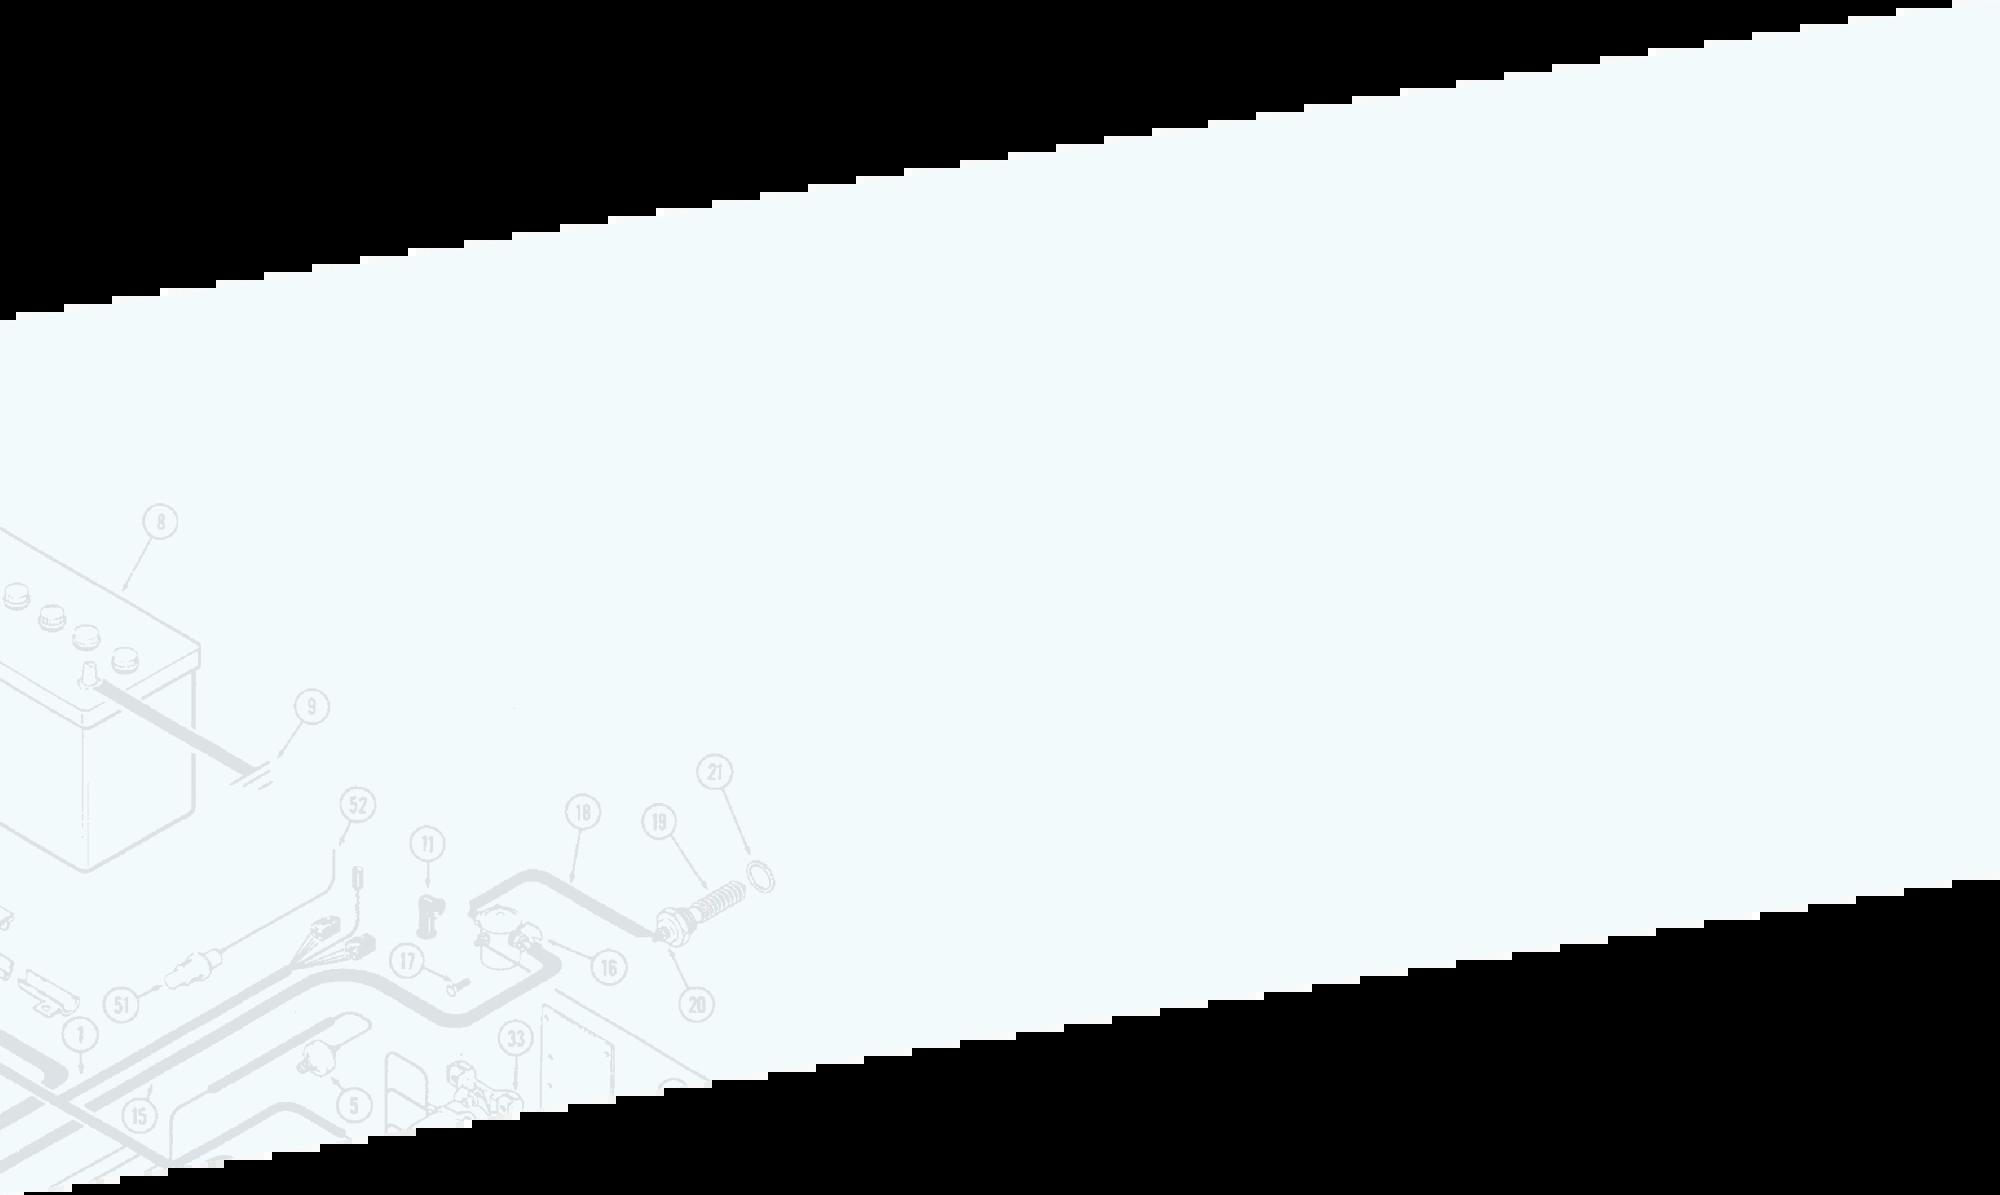 RVIA bg image panel 3